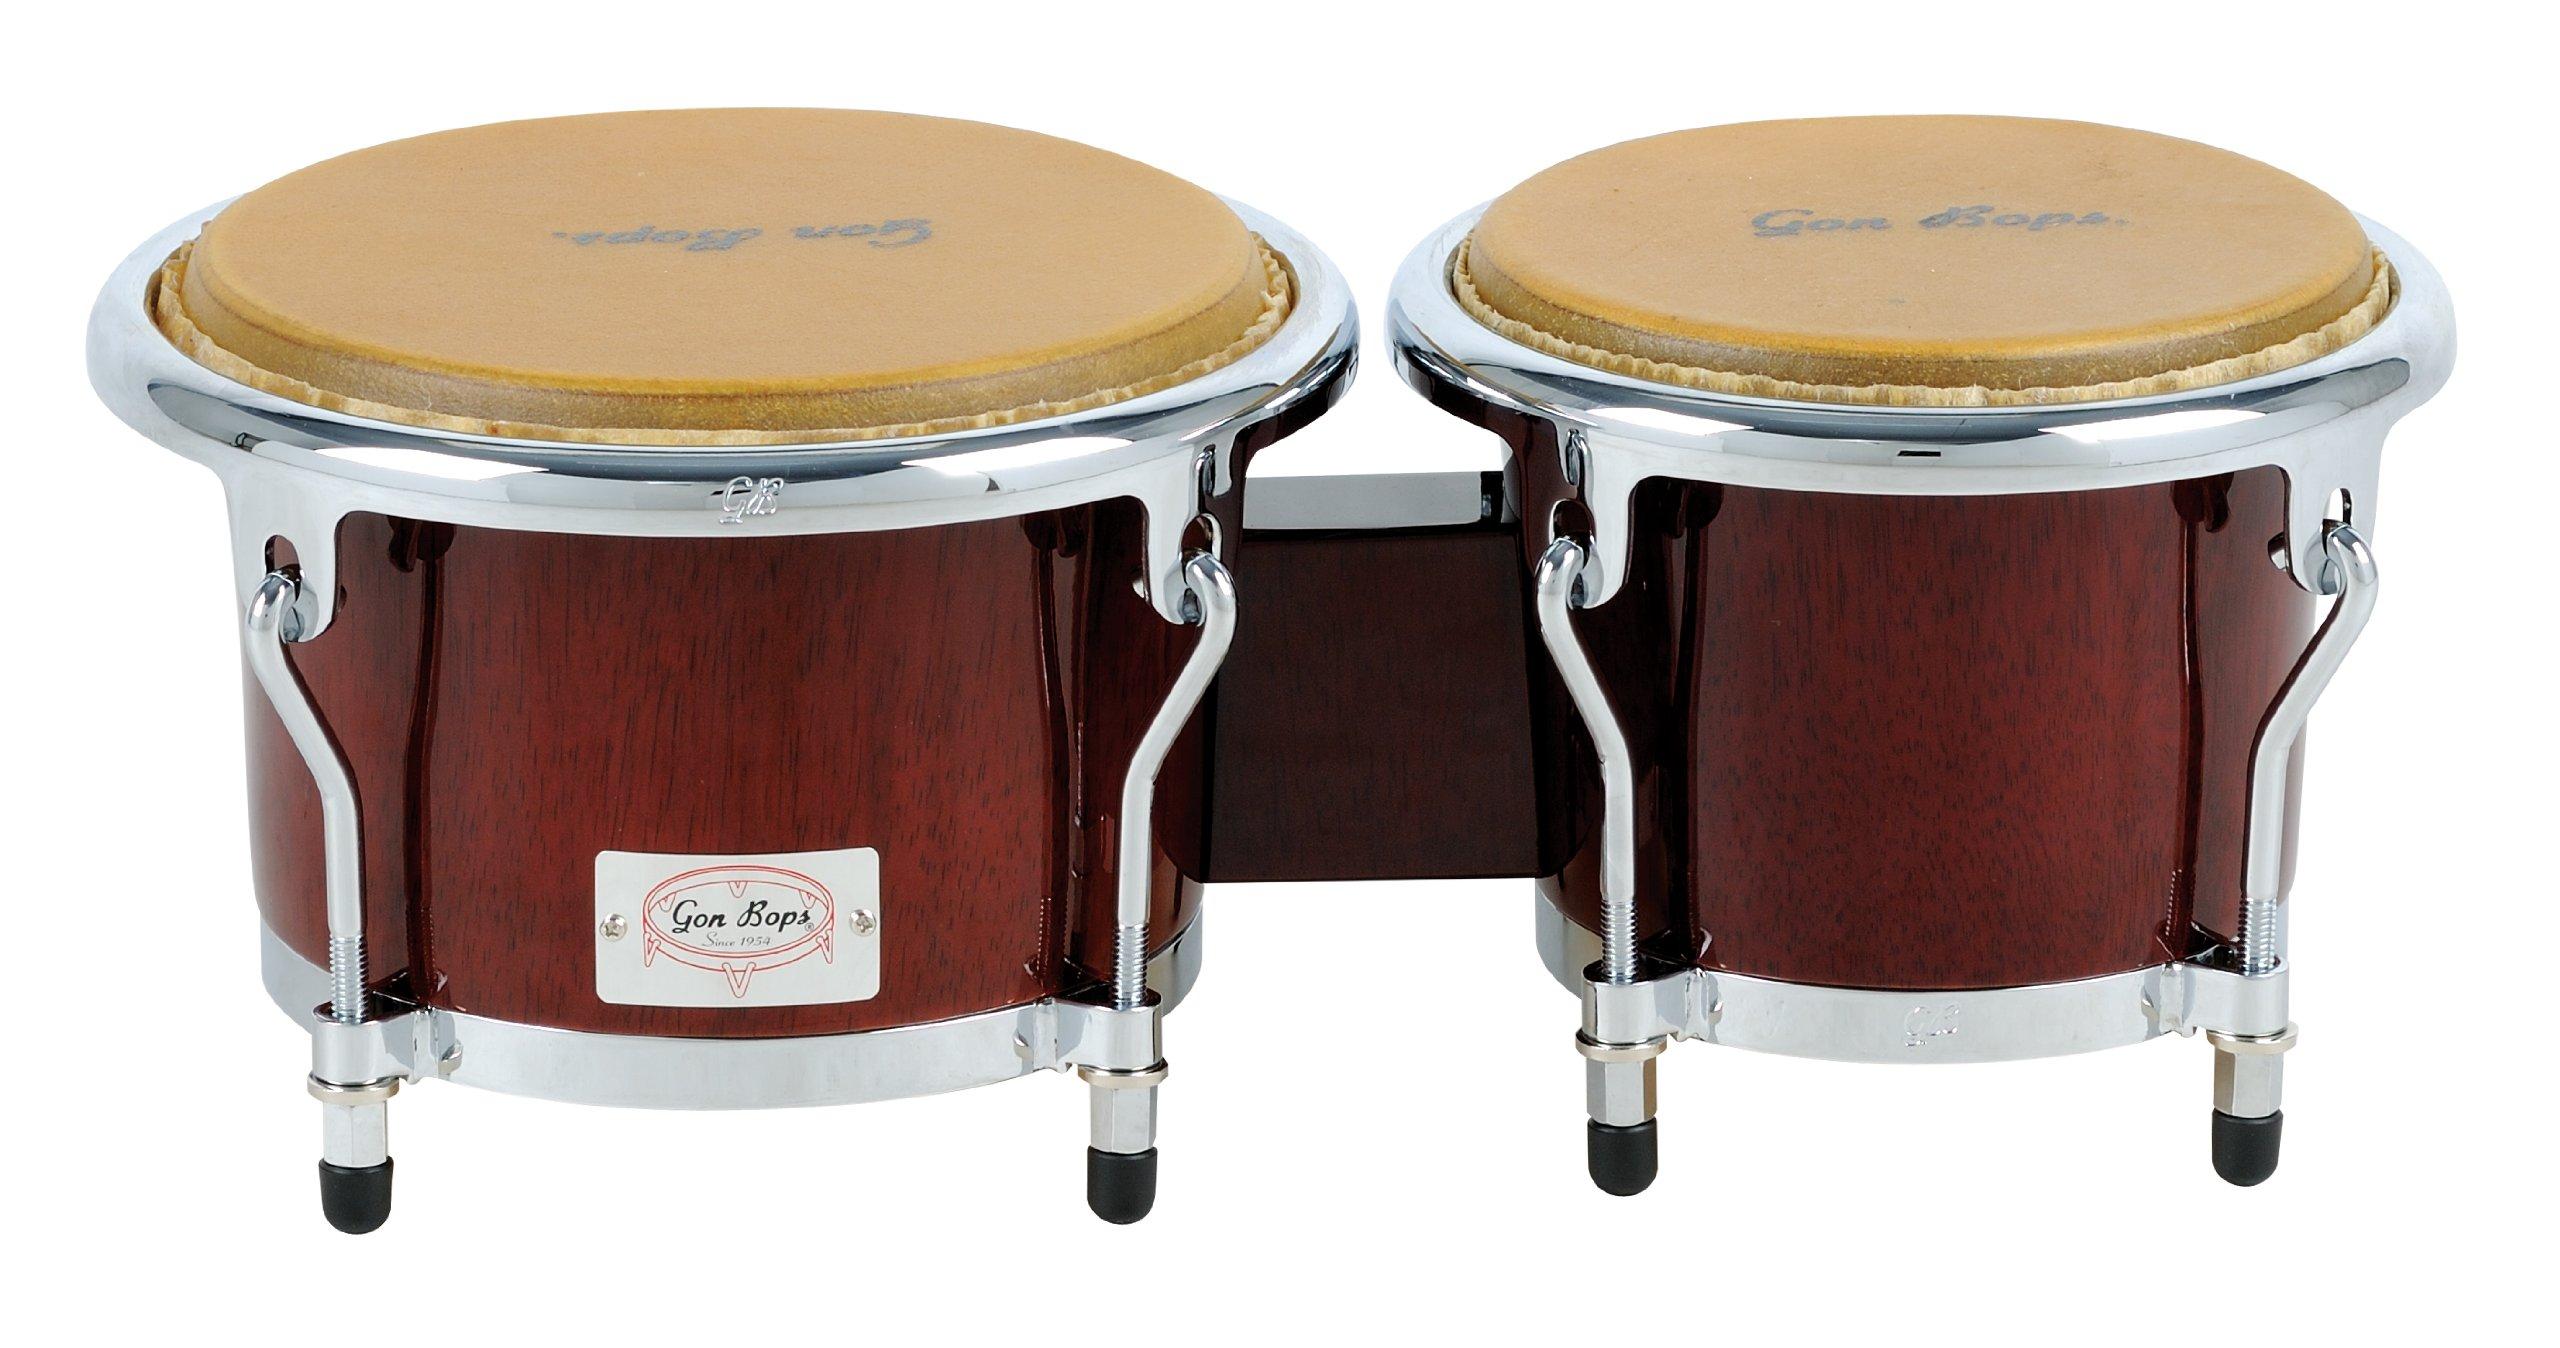 Gon Bops Tumbao Pro Series Bongo, 7 and 8.5-inch, Walnut Stain